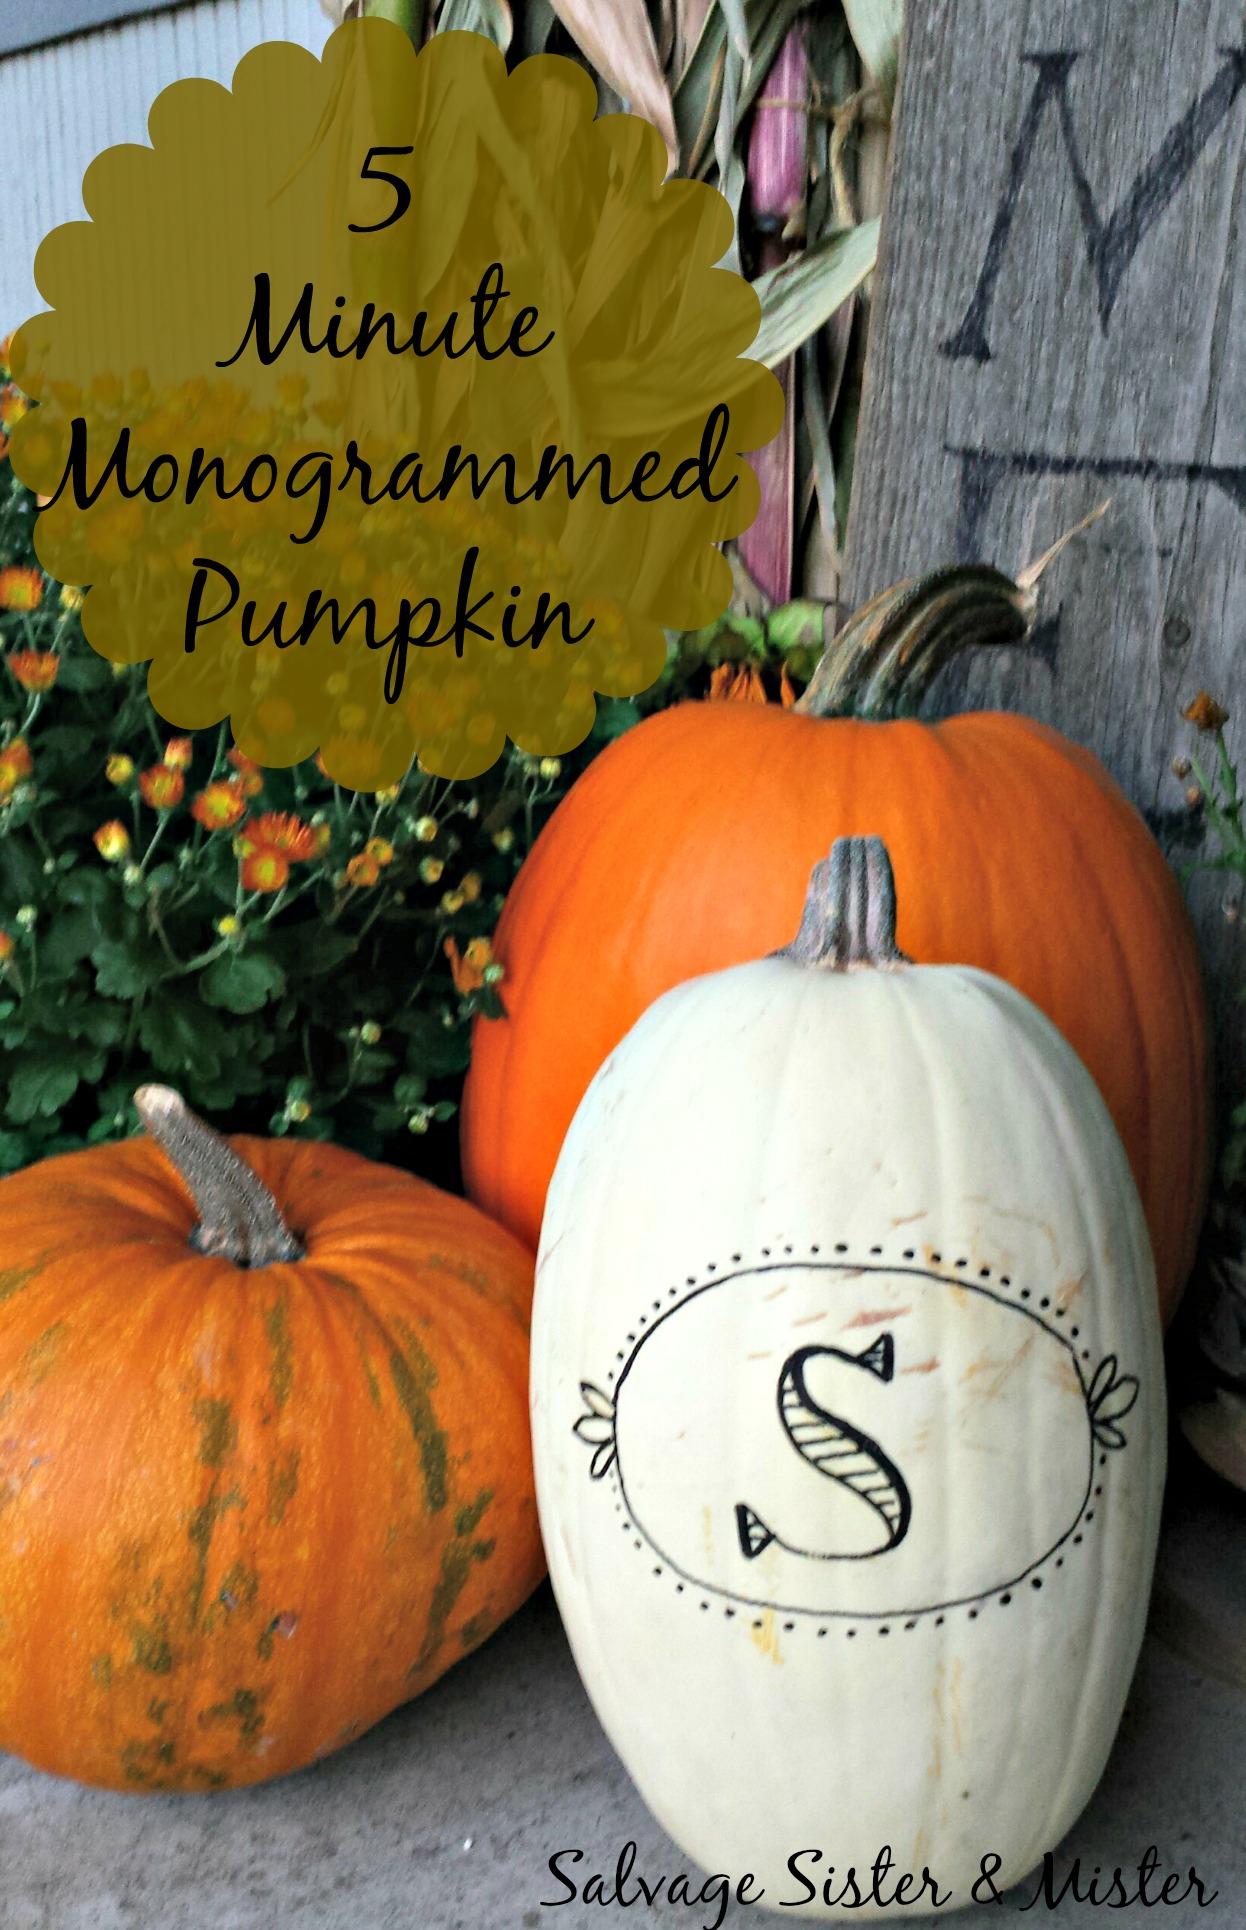 five minute monogramed pumpkin